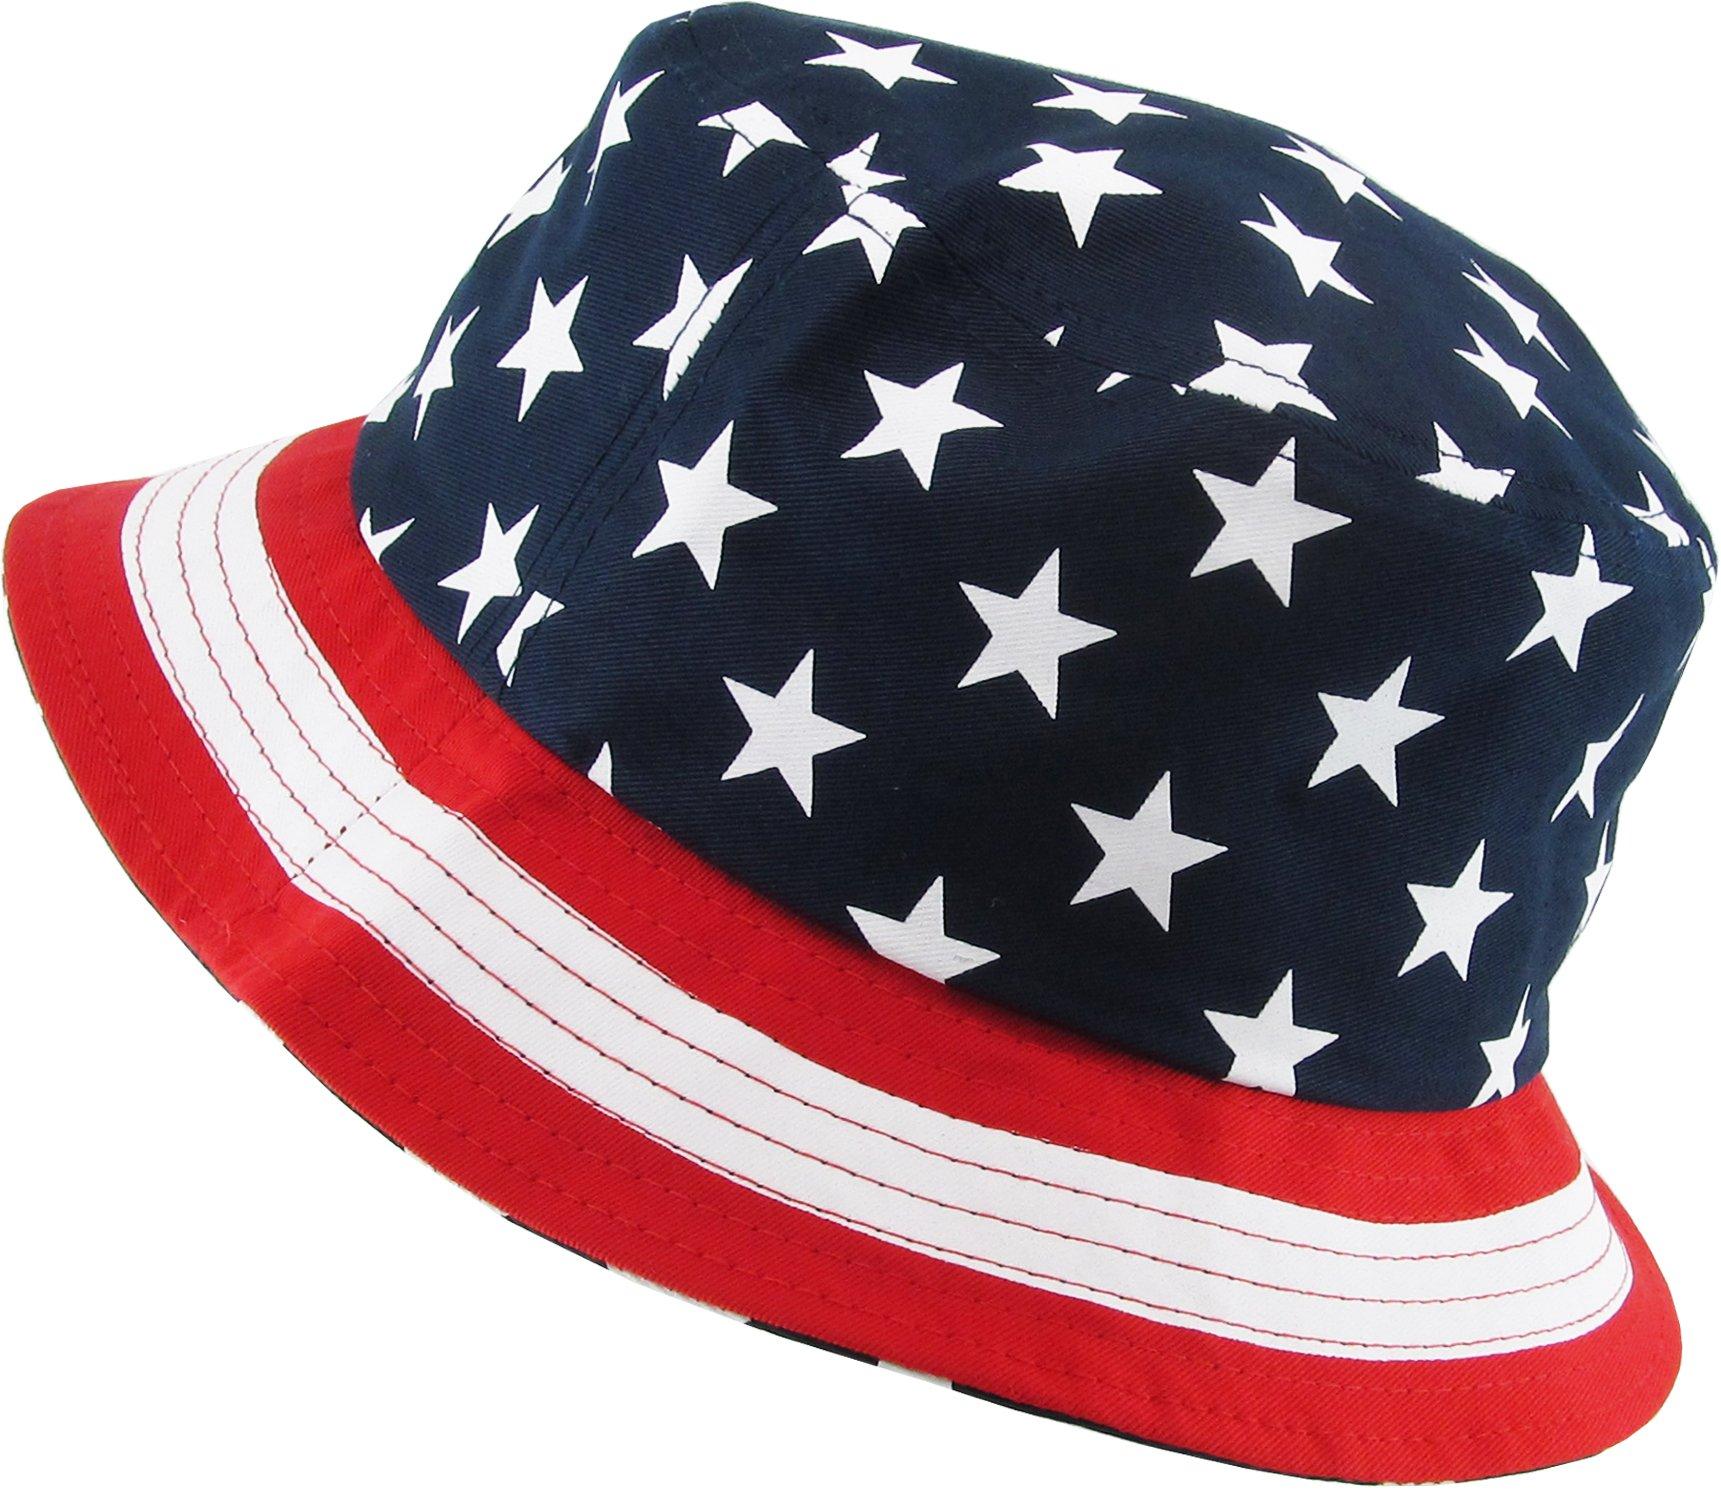 KBM-021 NAV USA American Flag Print Bucket Hat Cotton Summer Boonie by KBETHOS (Image #3)